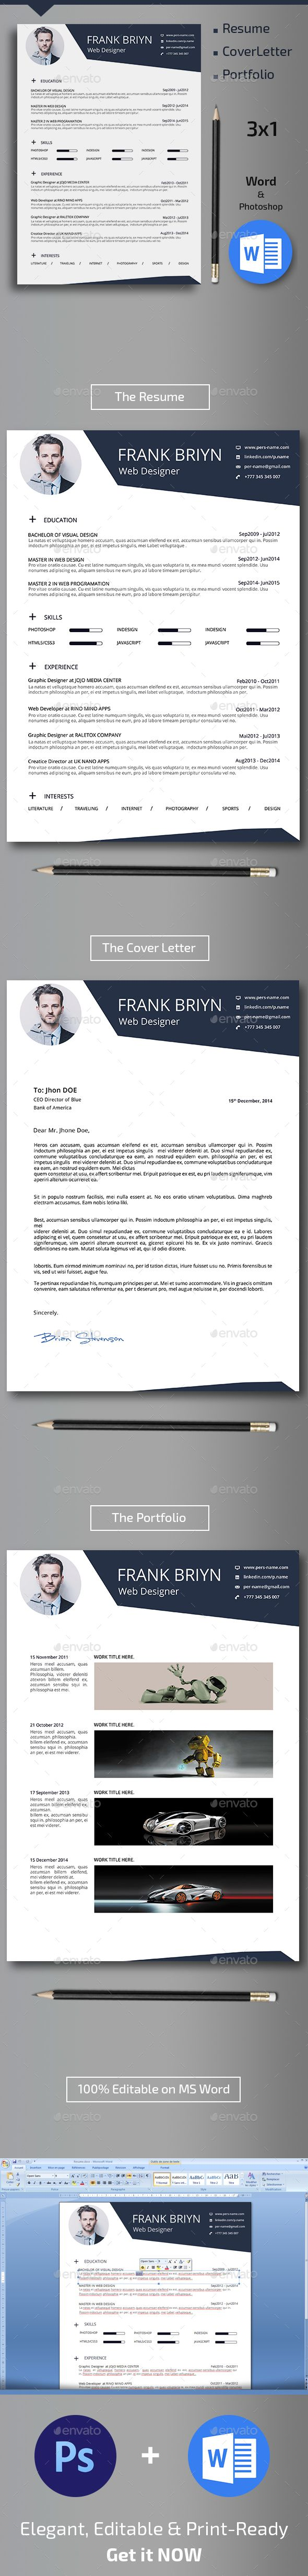 Resume Template PSD #design Download: http://graphicriver.net/item/resume/13988443?ref=ksioks